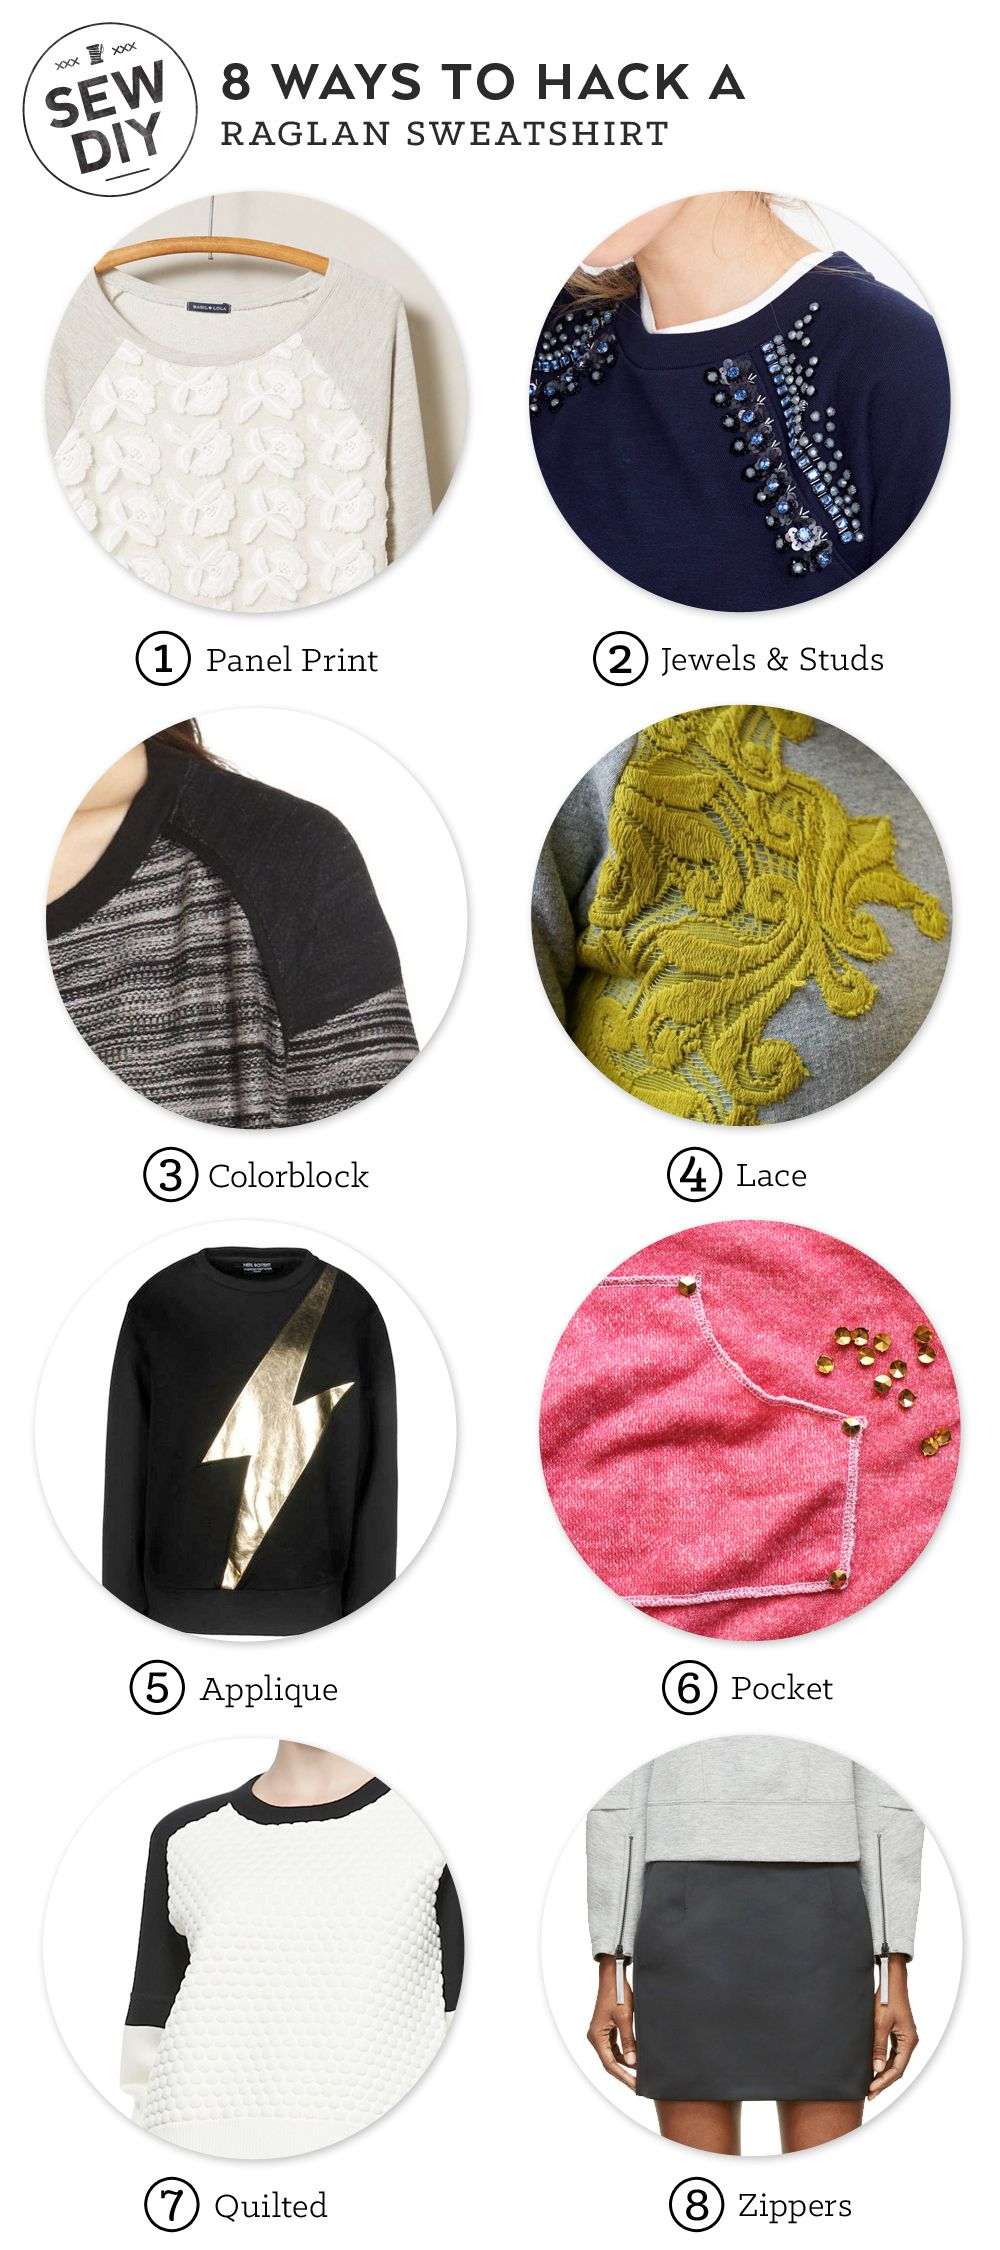 8 Ways To Hack A Sweatshirt Sew Diy Diy Sweatshirt Upcycle Clothes Fashion [ 2250 x 1000 Pixel ]